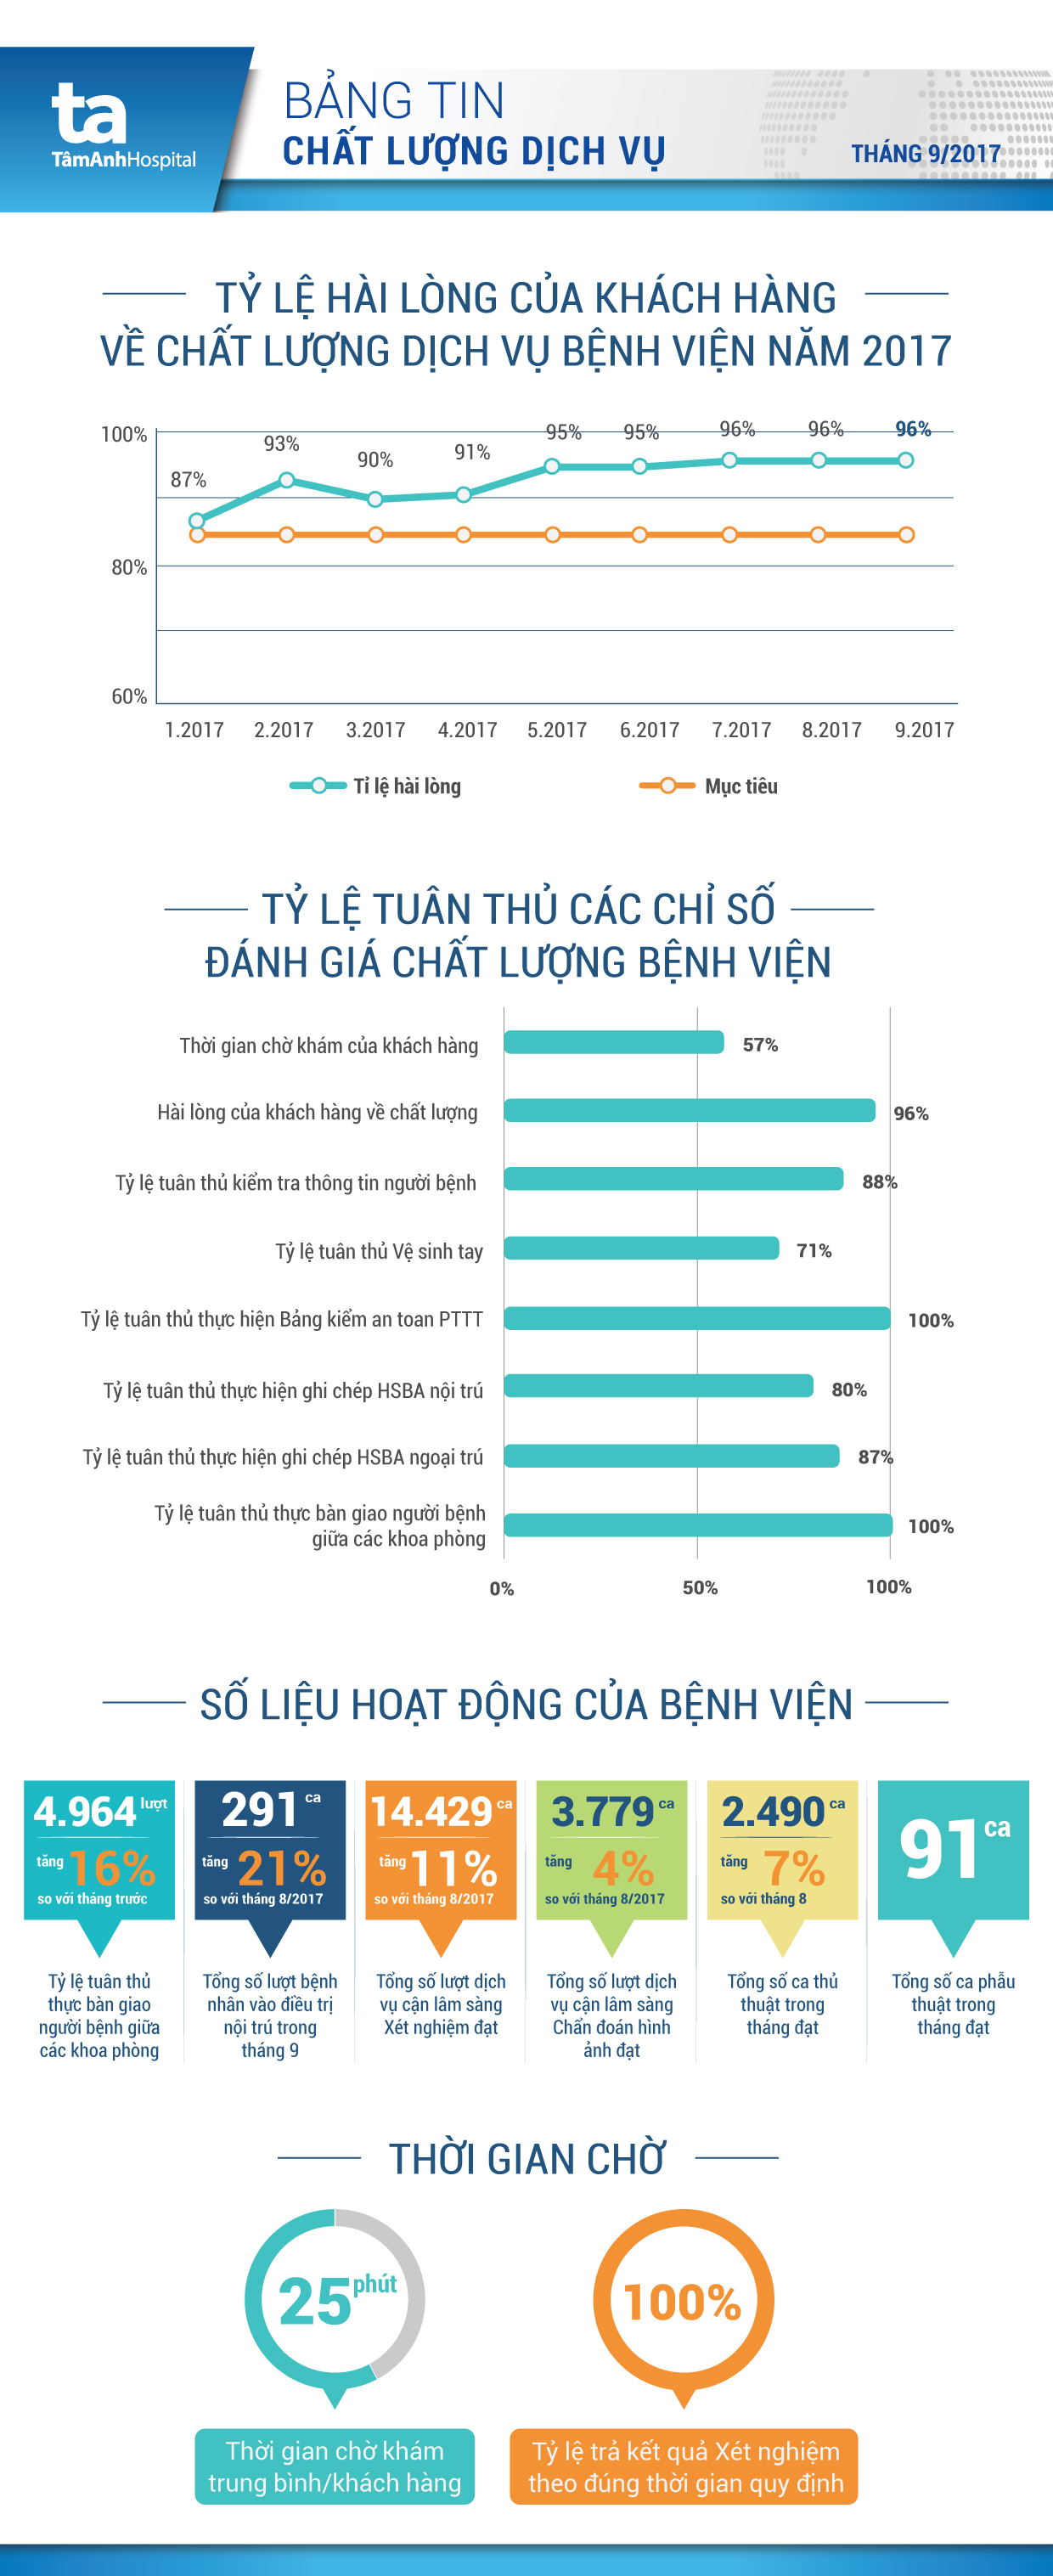 BVTA_BANTINCHATLUONG_Thang9-01